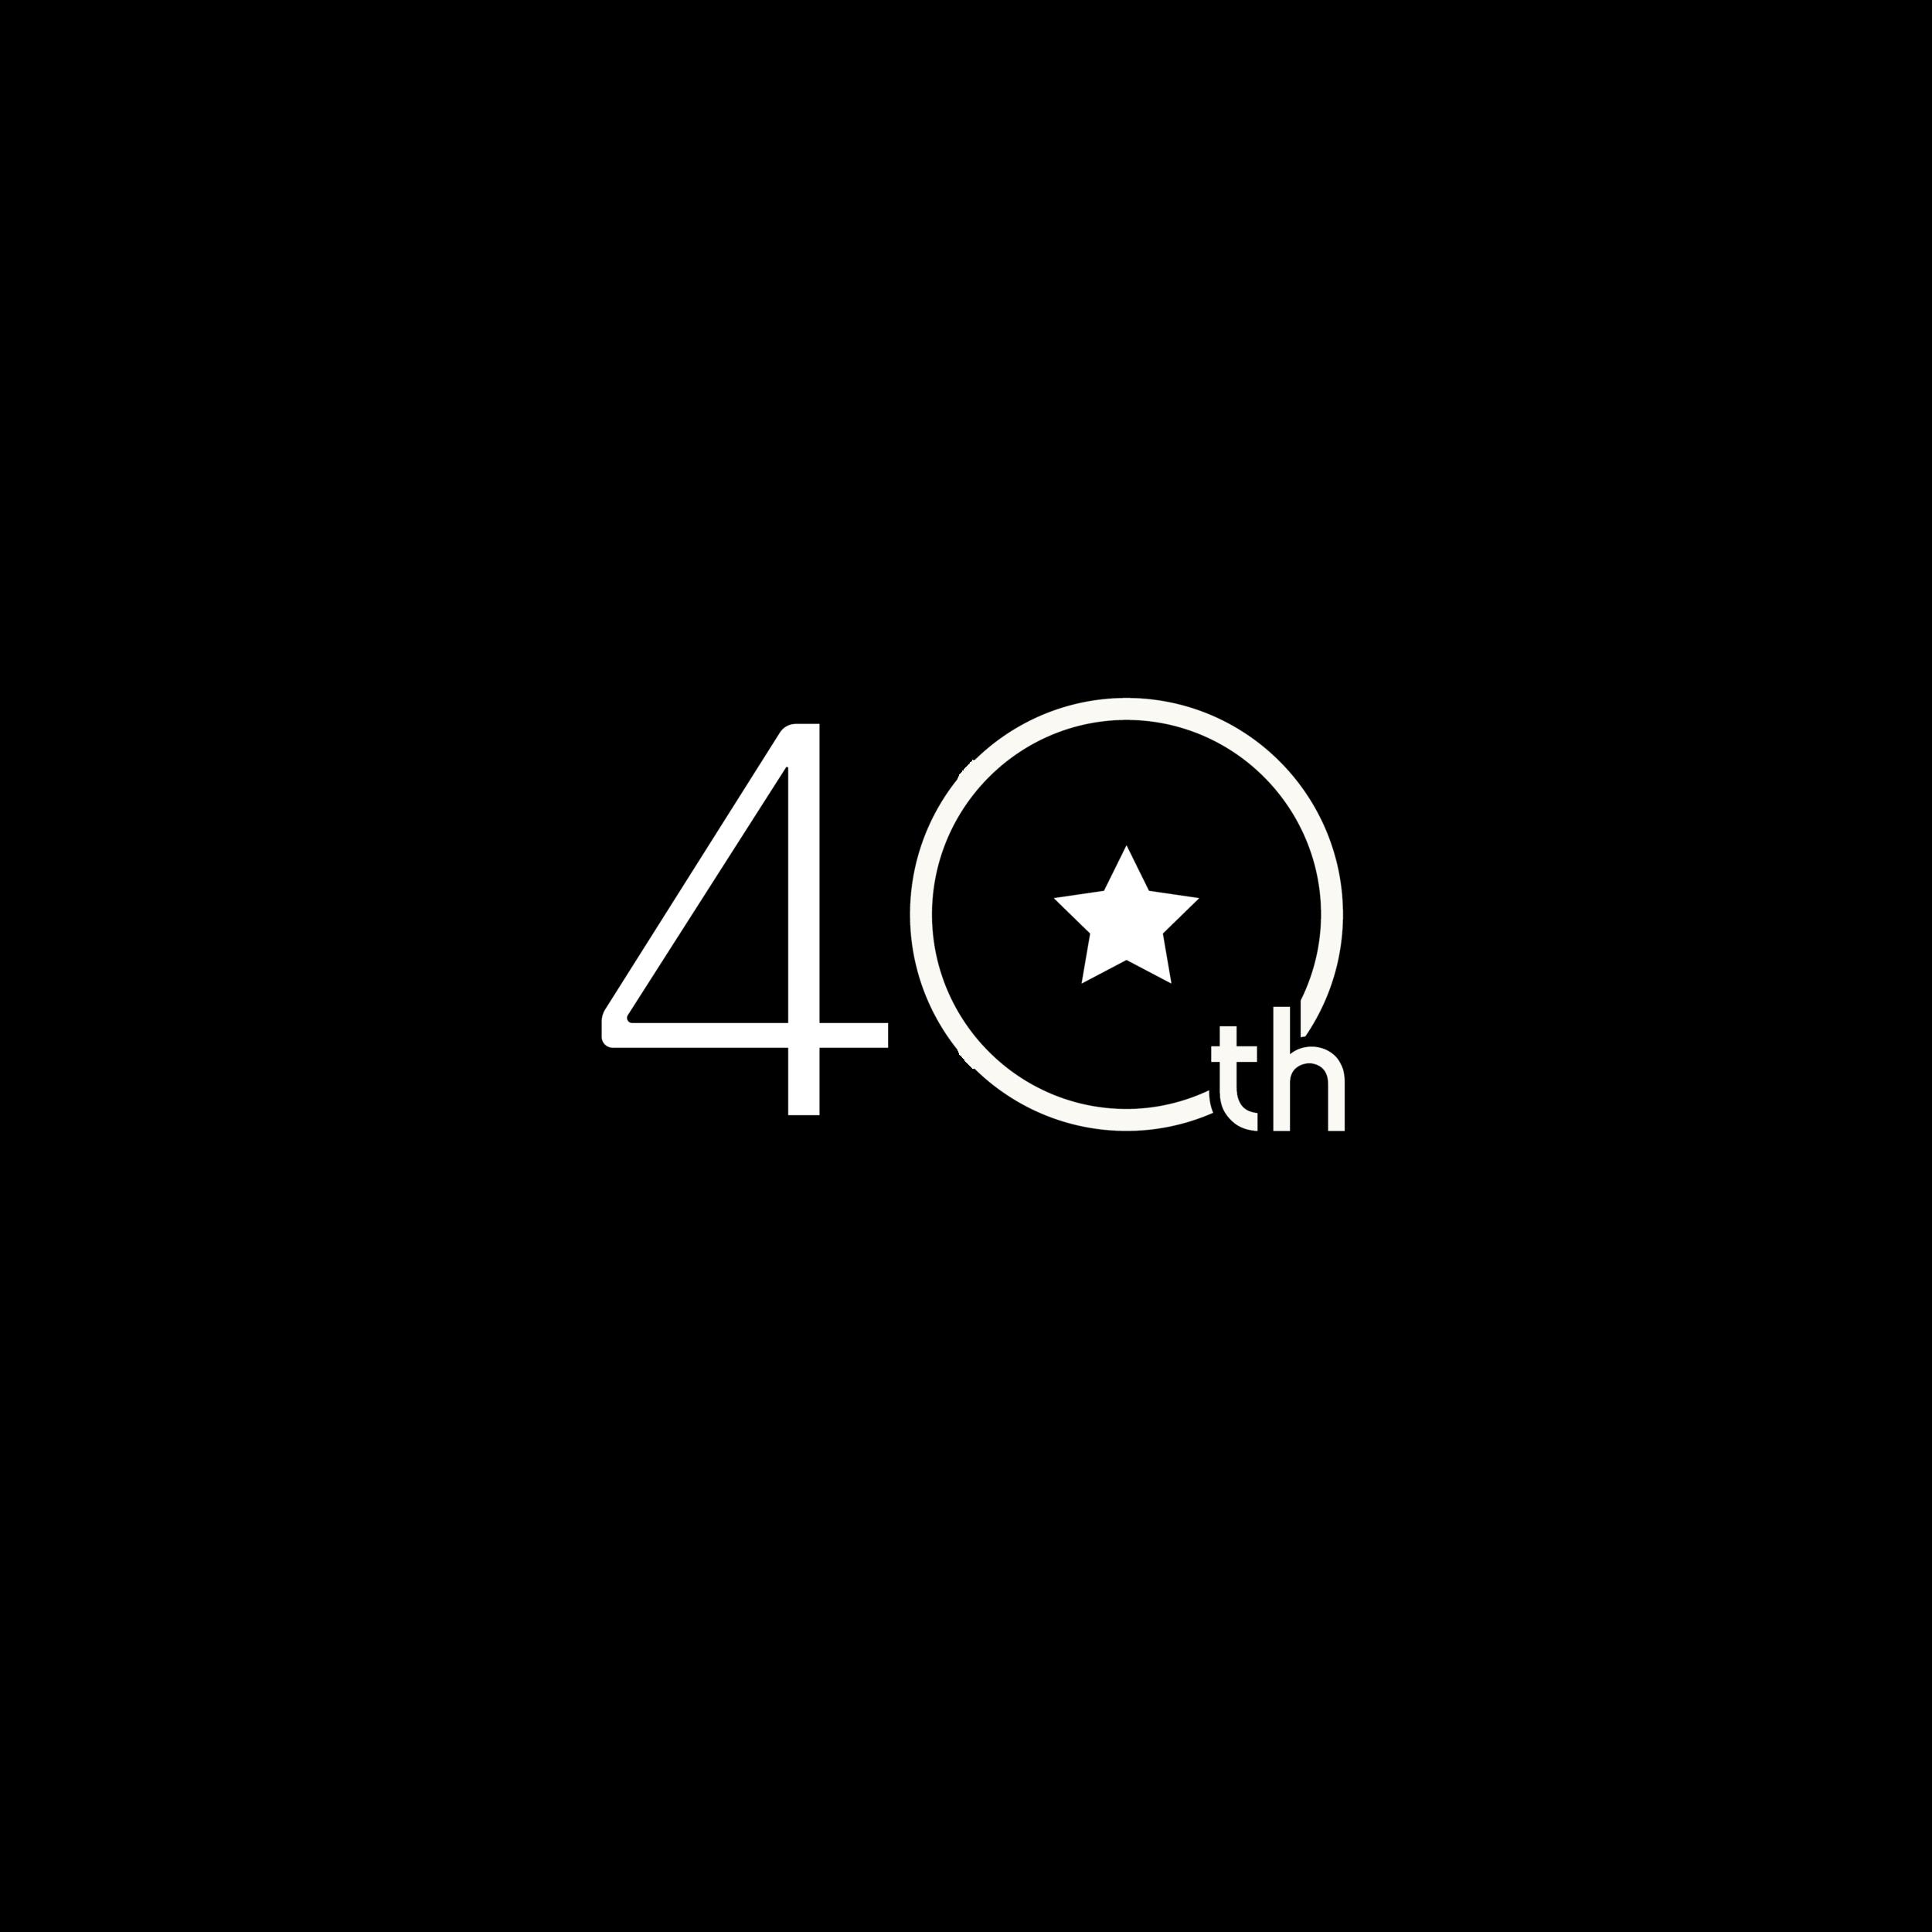 40th_Anniversary_Logo.png